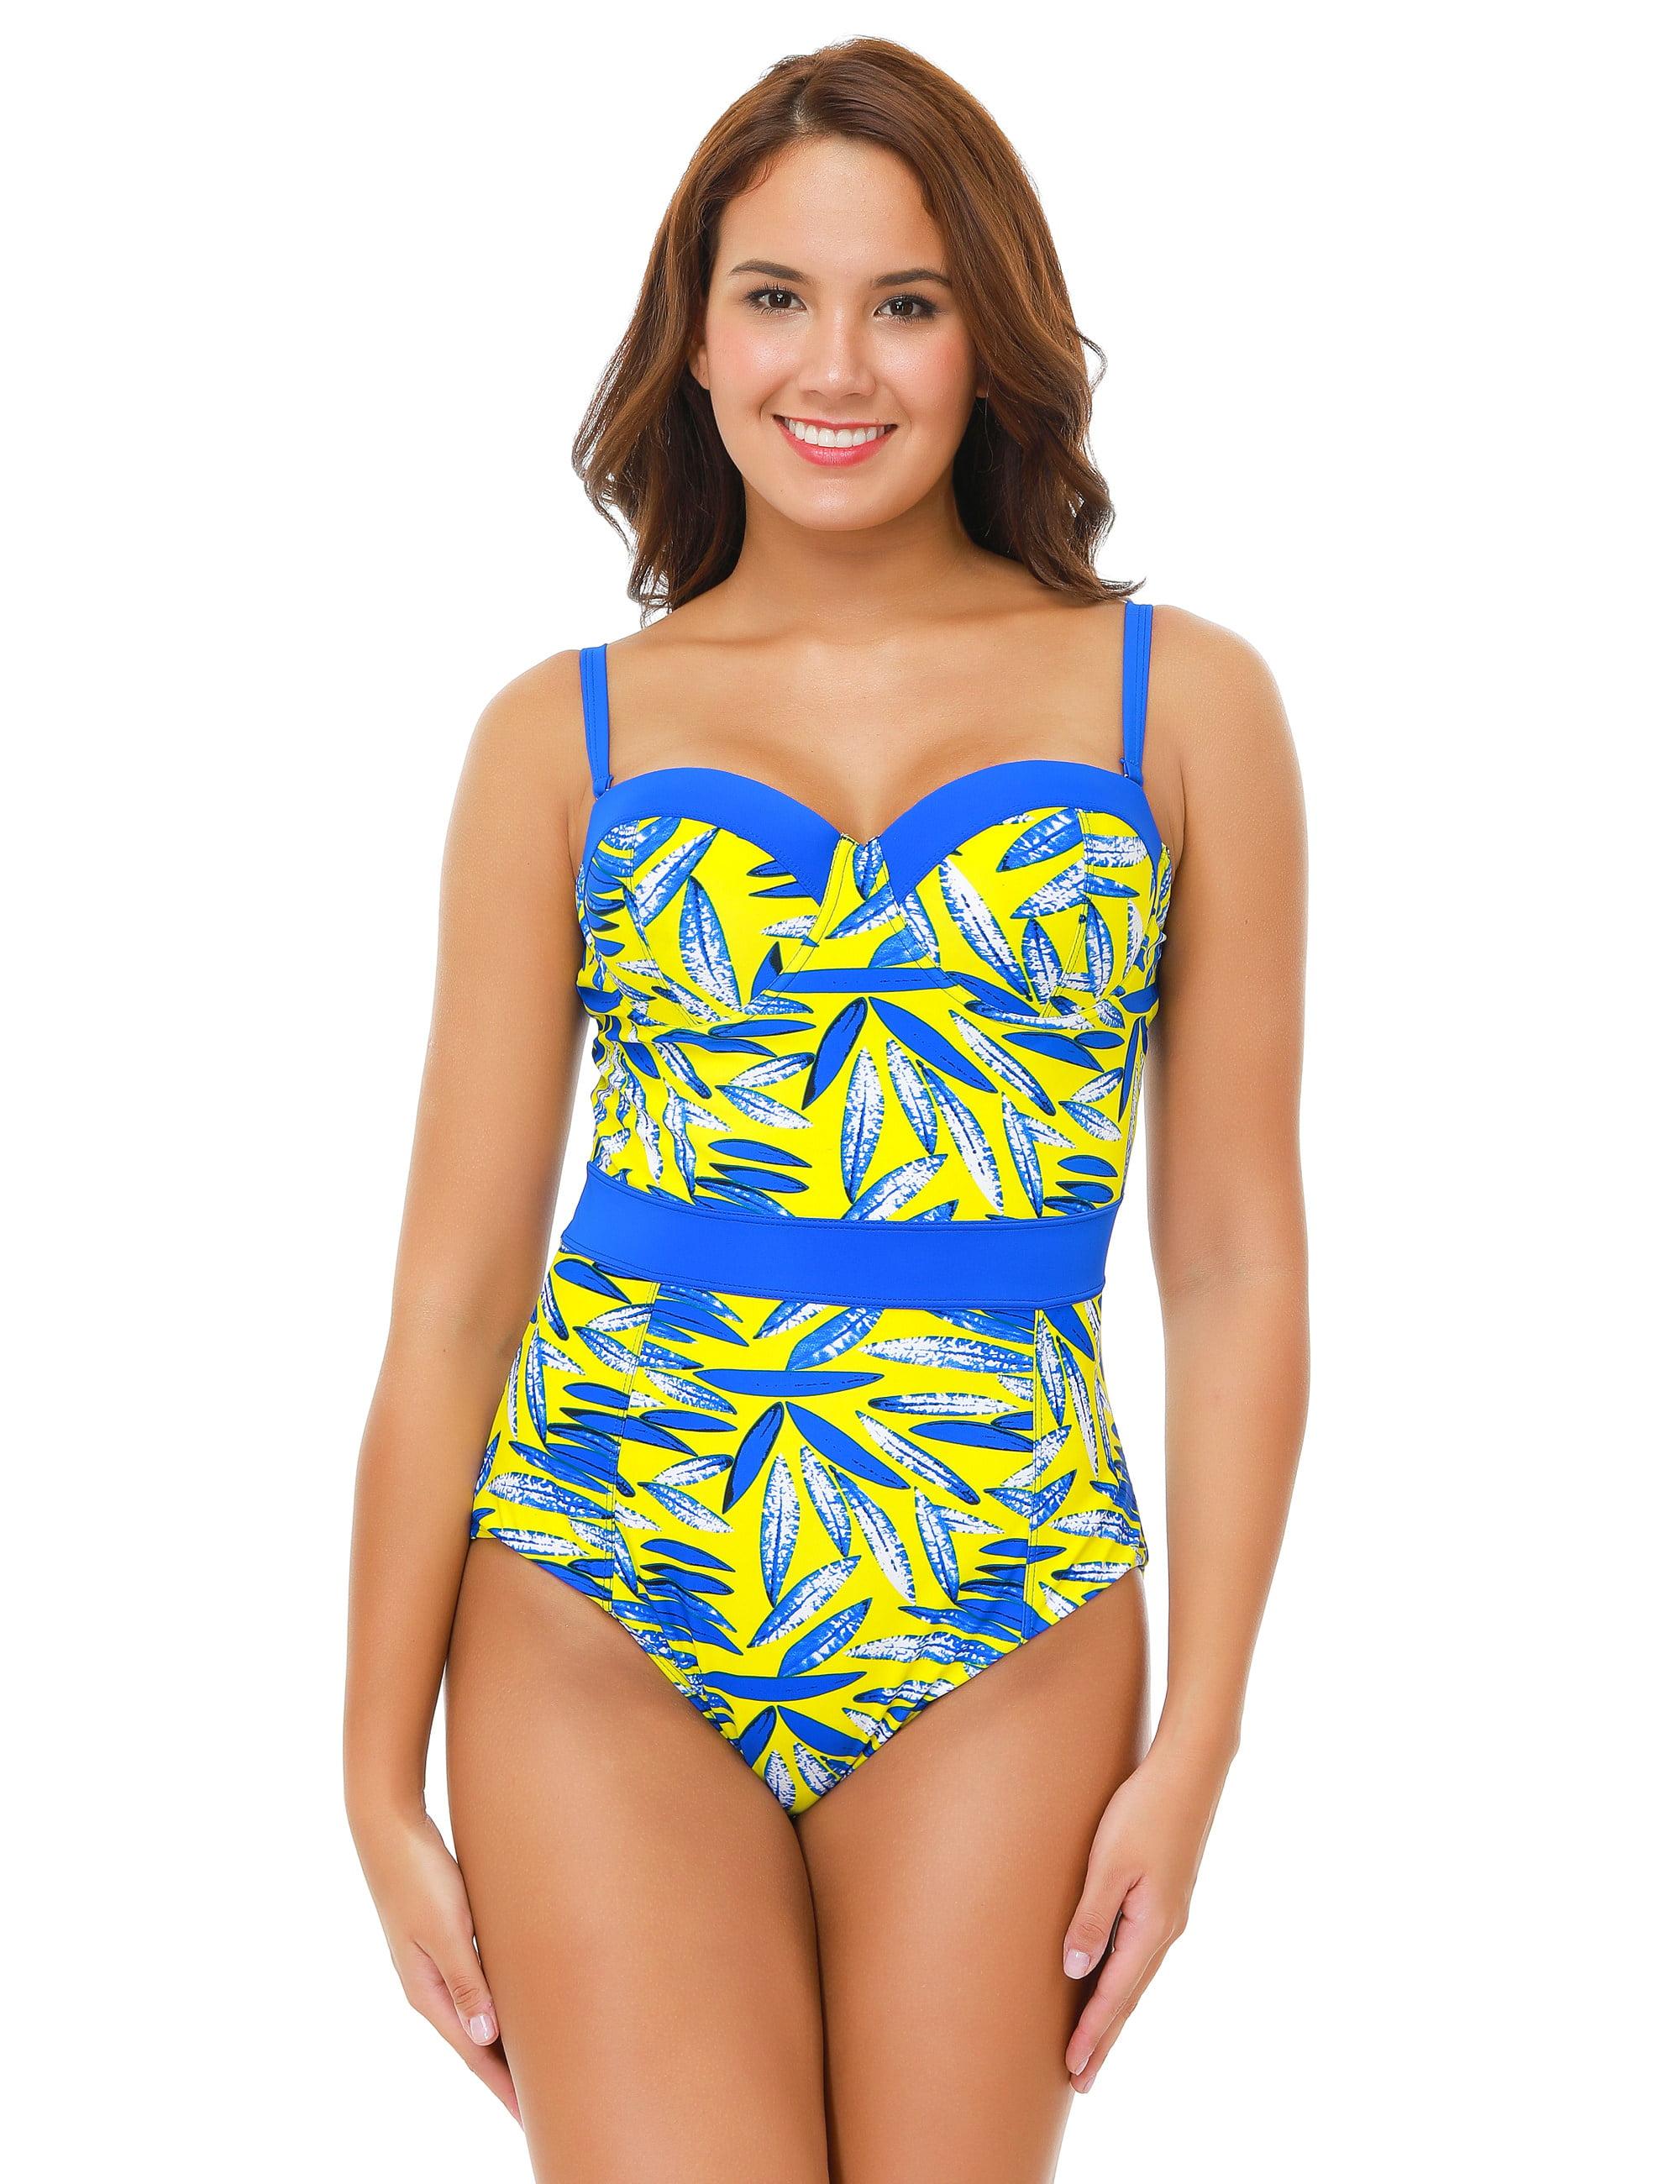 47f3aca08a58b SENFLOCO - Senfloco Women Plus Size Swimwear Sexy One-Piece Bikini Swimsuit  Leaves Vintage Bathing Suit with Bra Top, L-4XL - Walmart.com